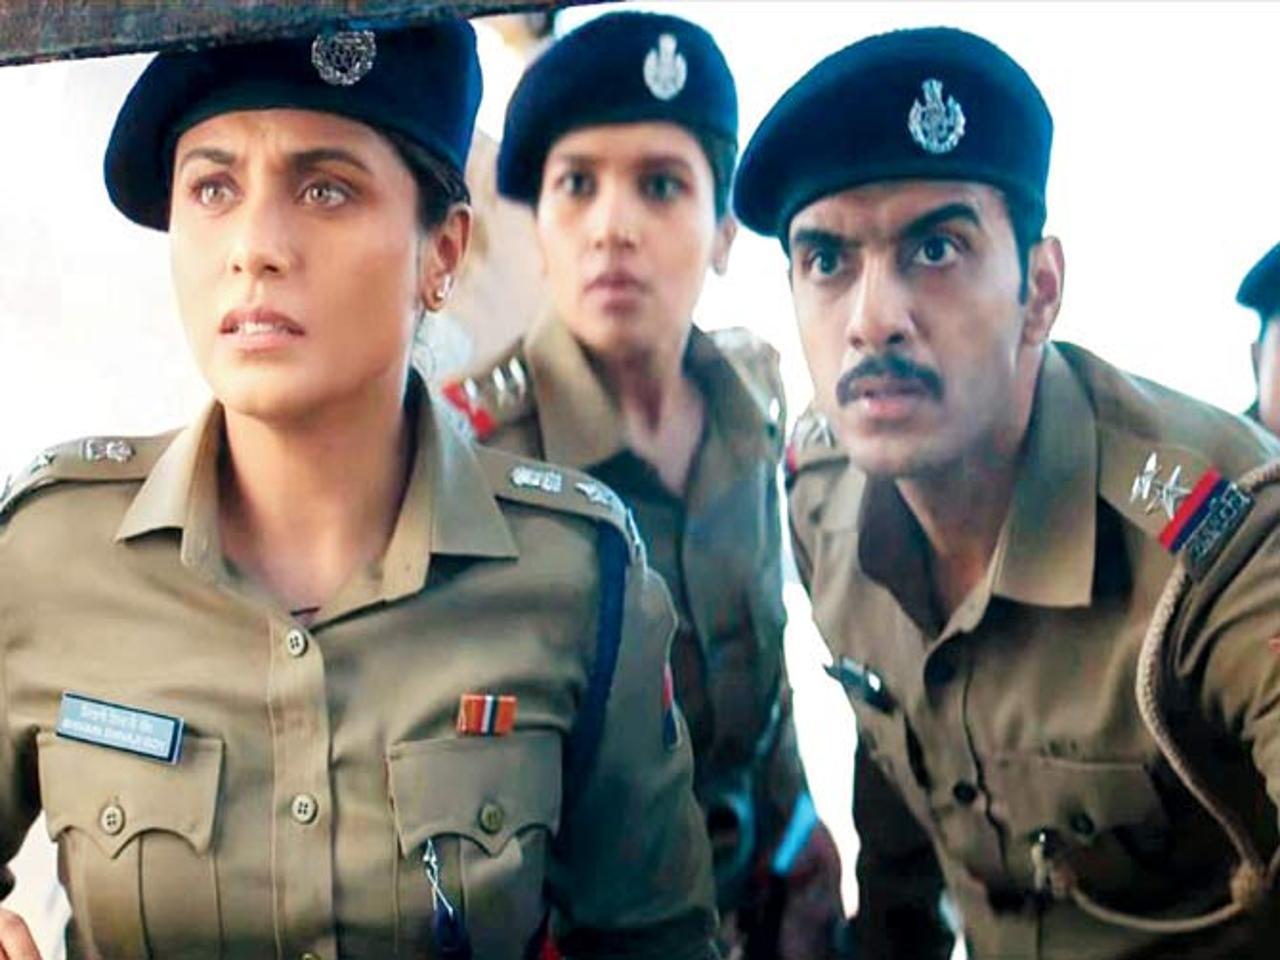 Mardaani 2 Full Movie Download 2019 BluRay 1080p TamilRockers YTS